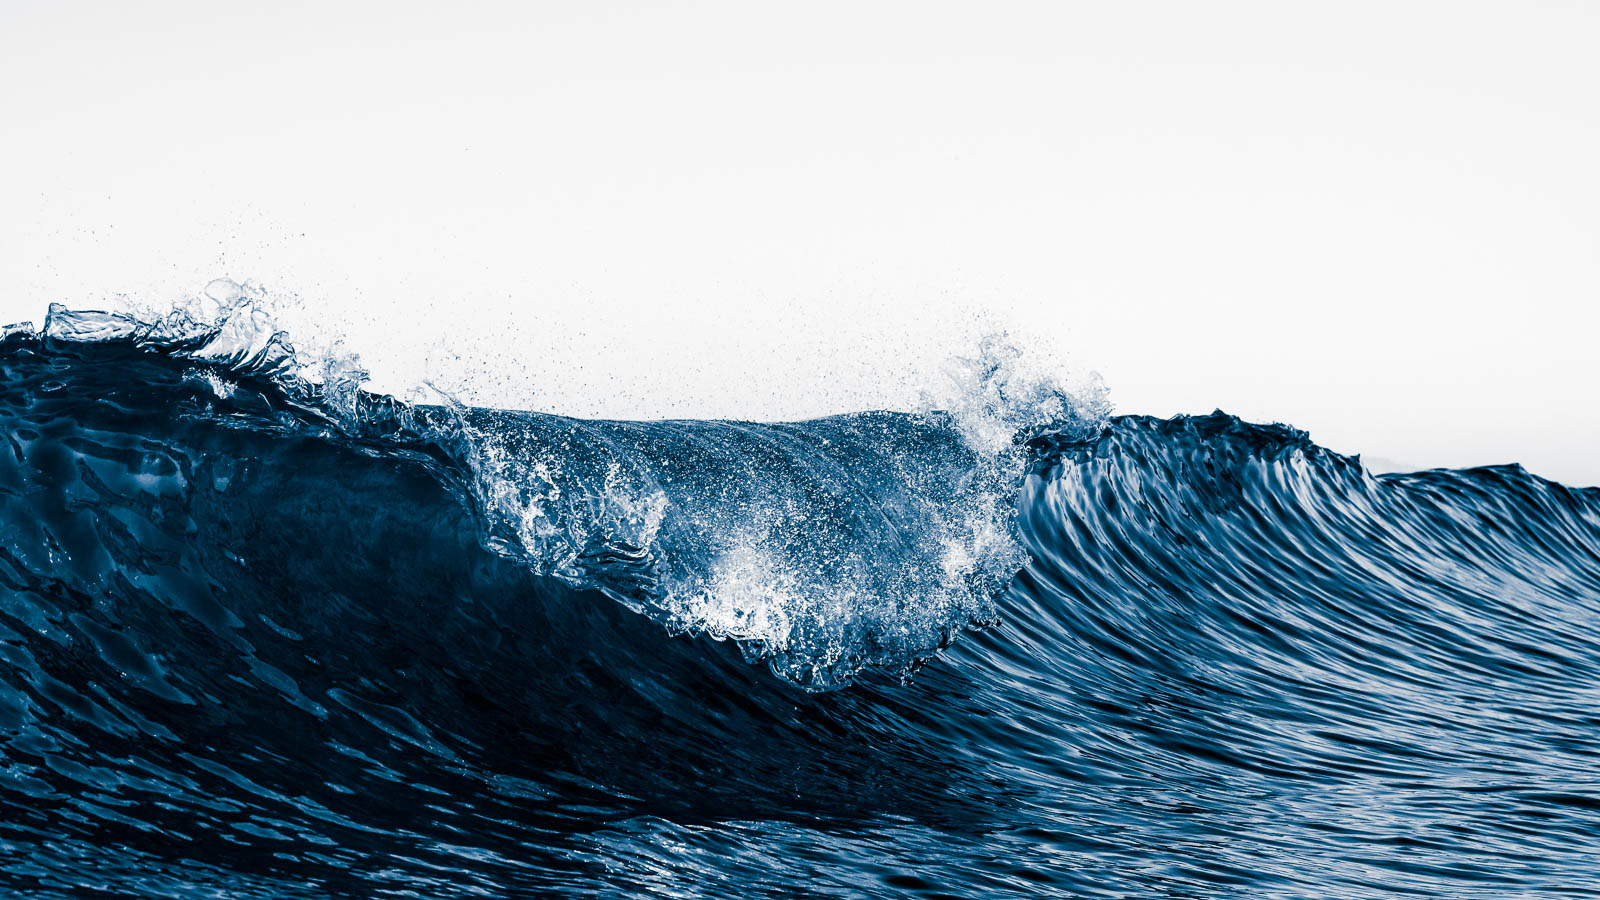 8_Newport-Beach-wave-art_Joseph-Barber-Photography.jpg